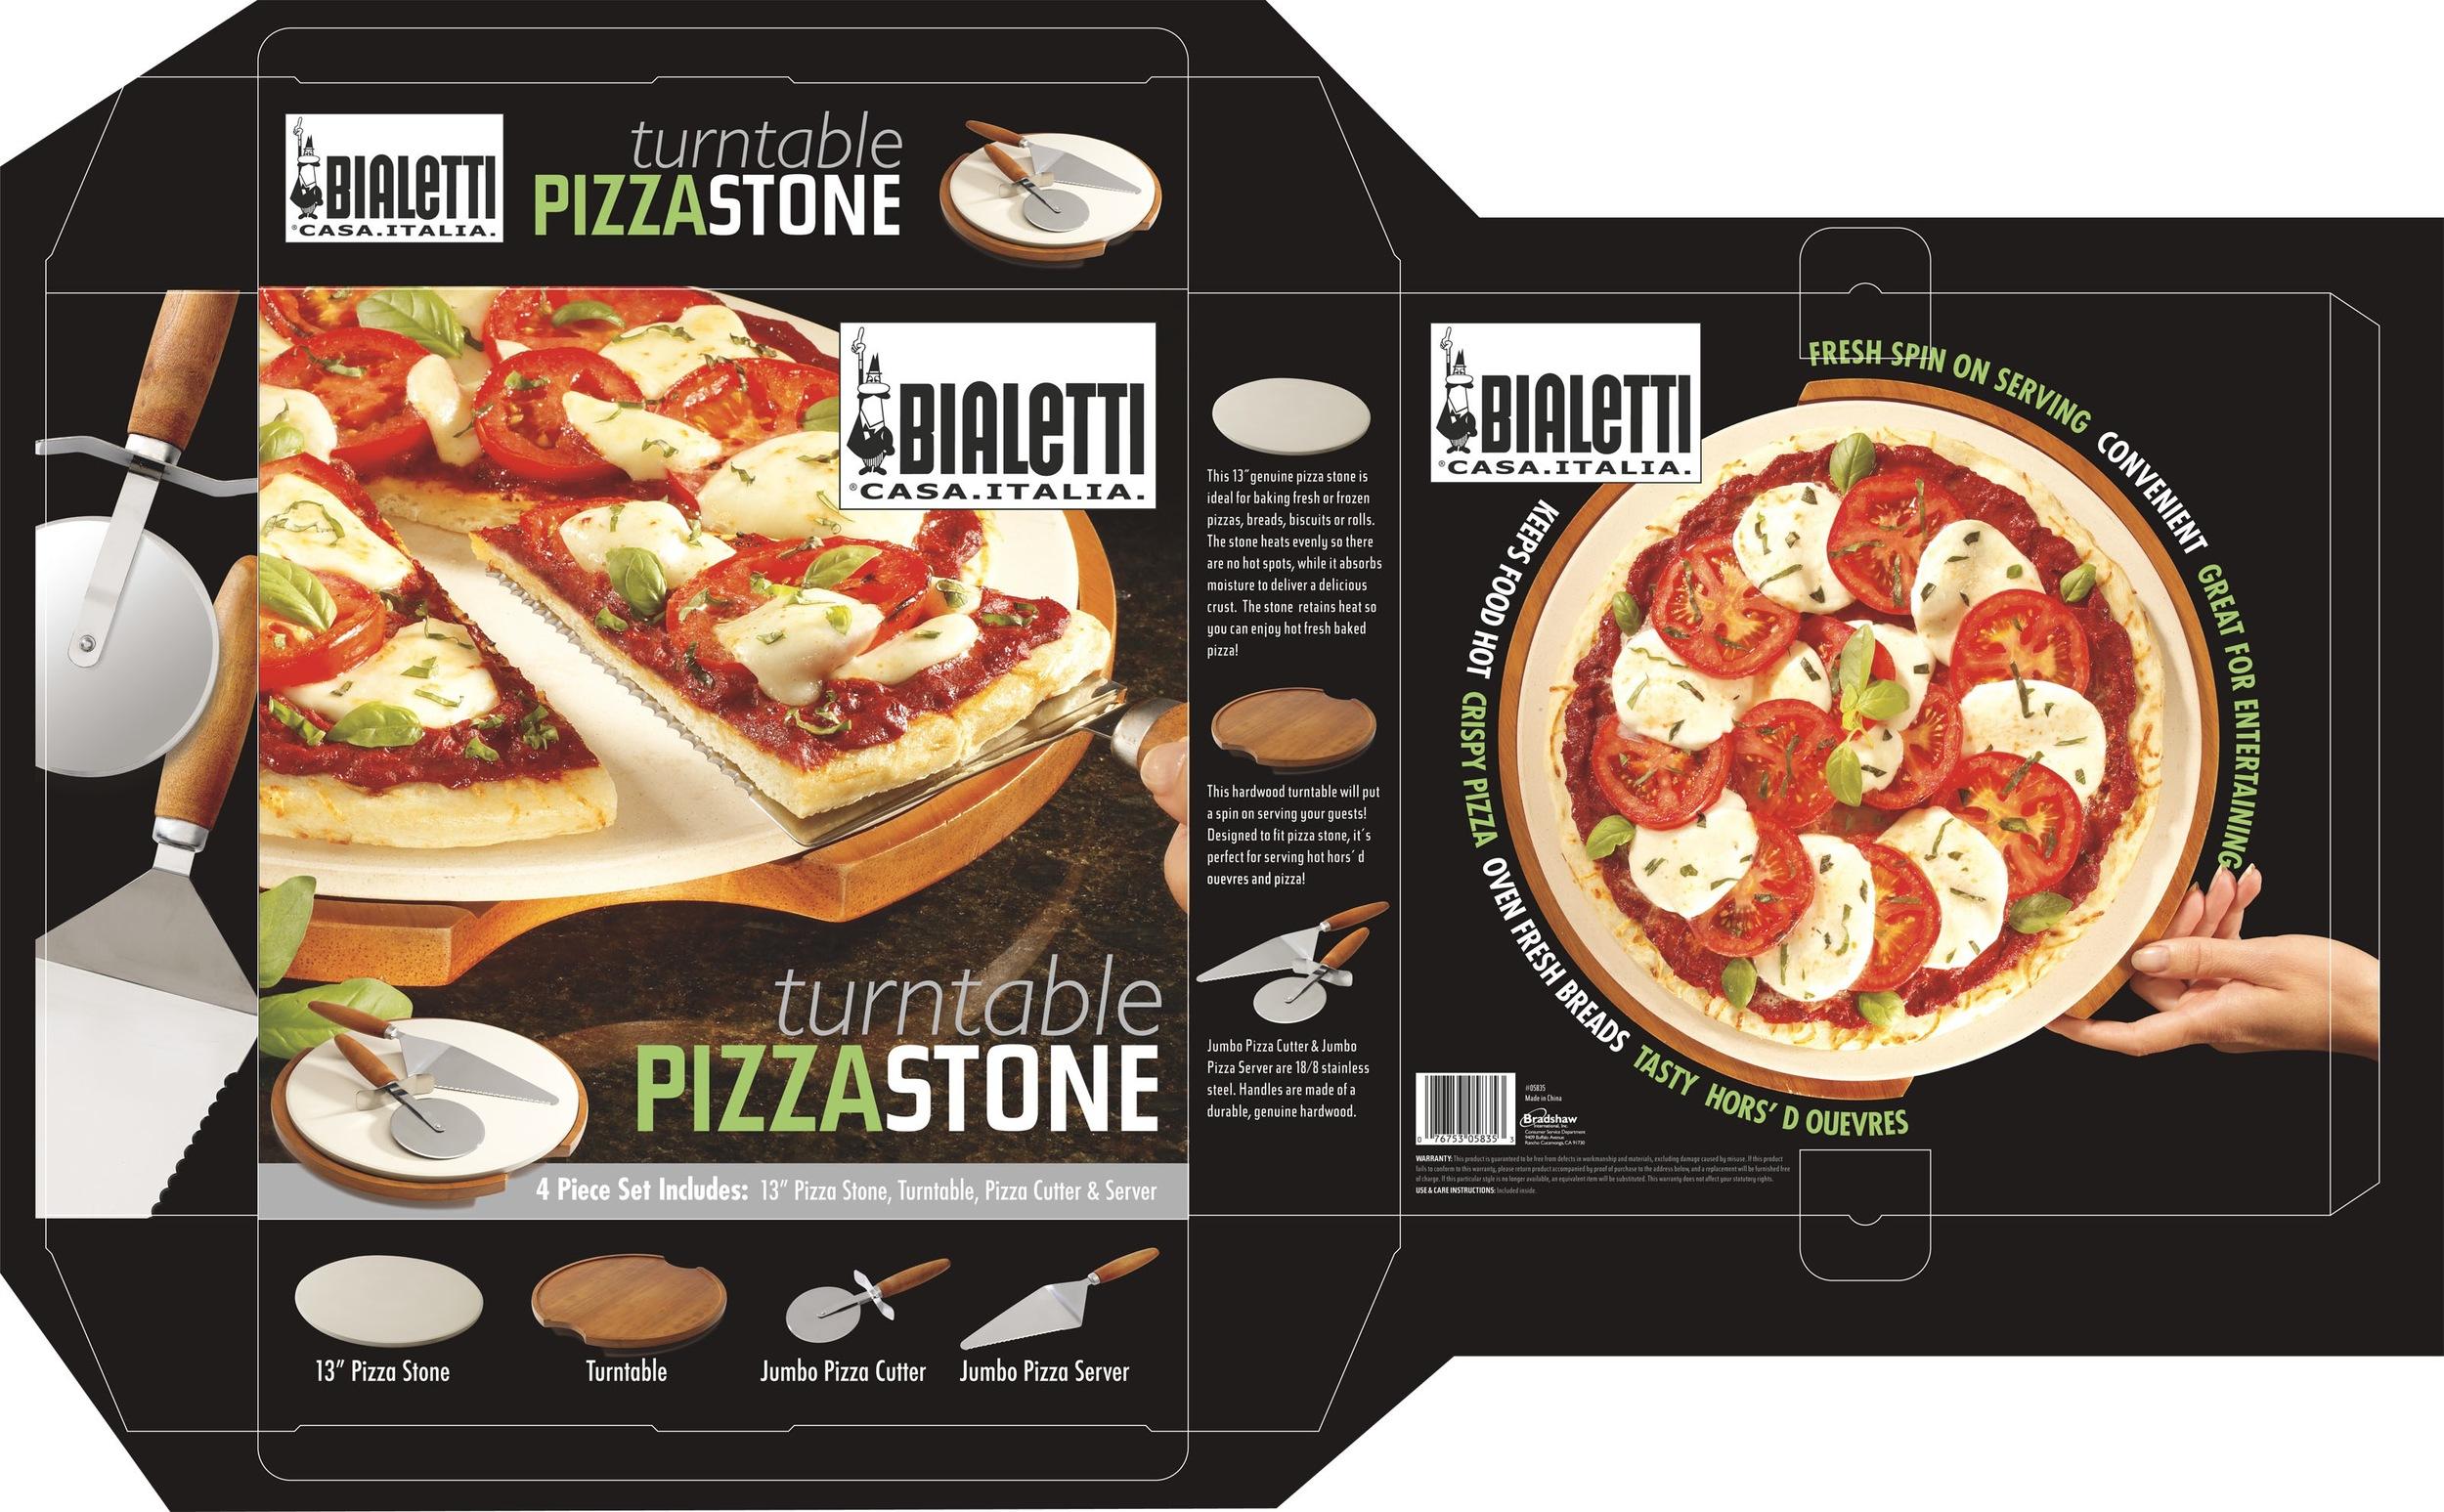 Bialetti Pizza Stone